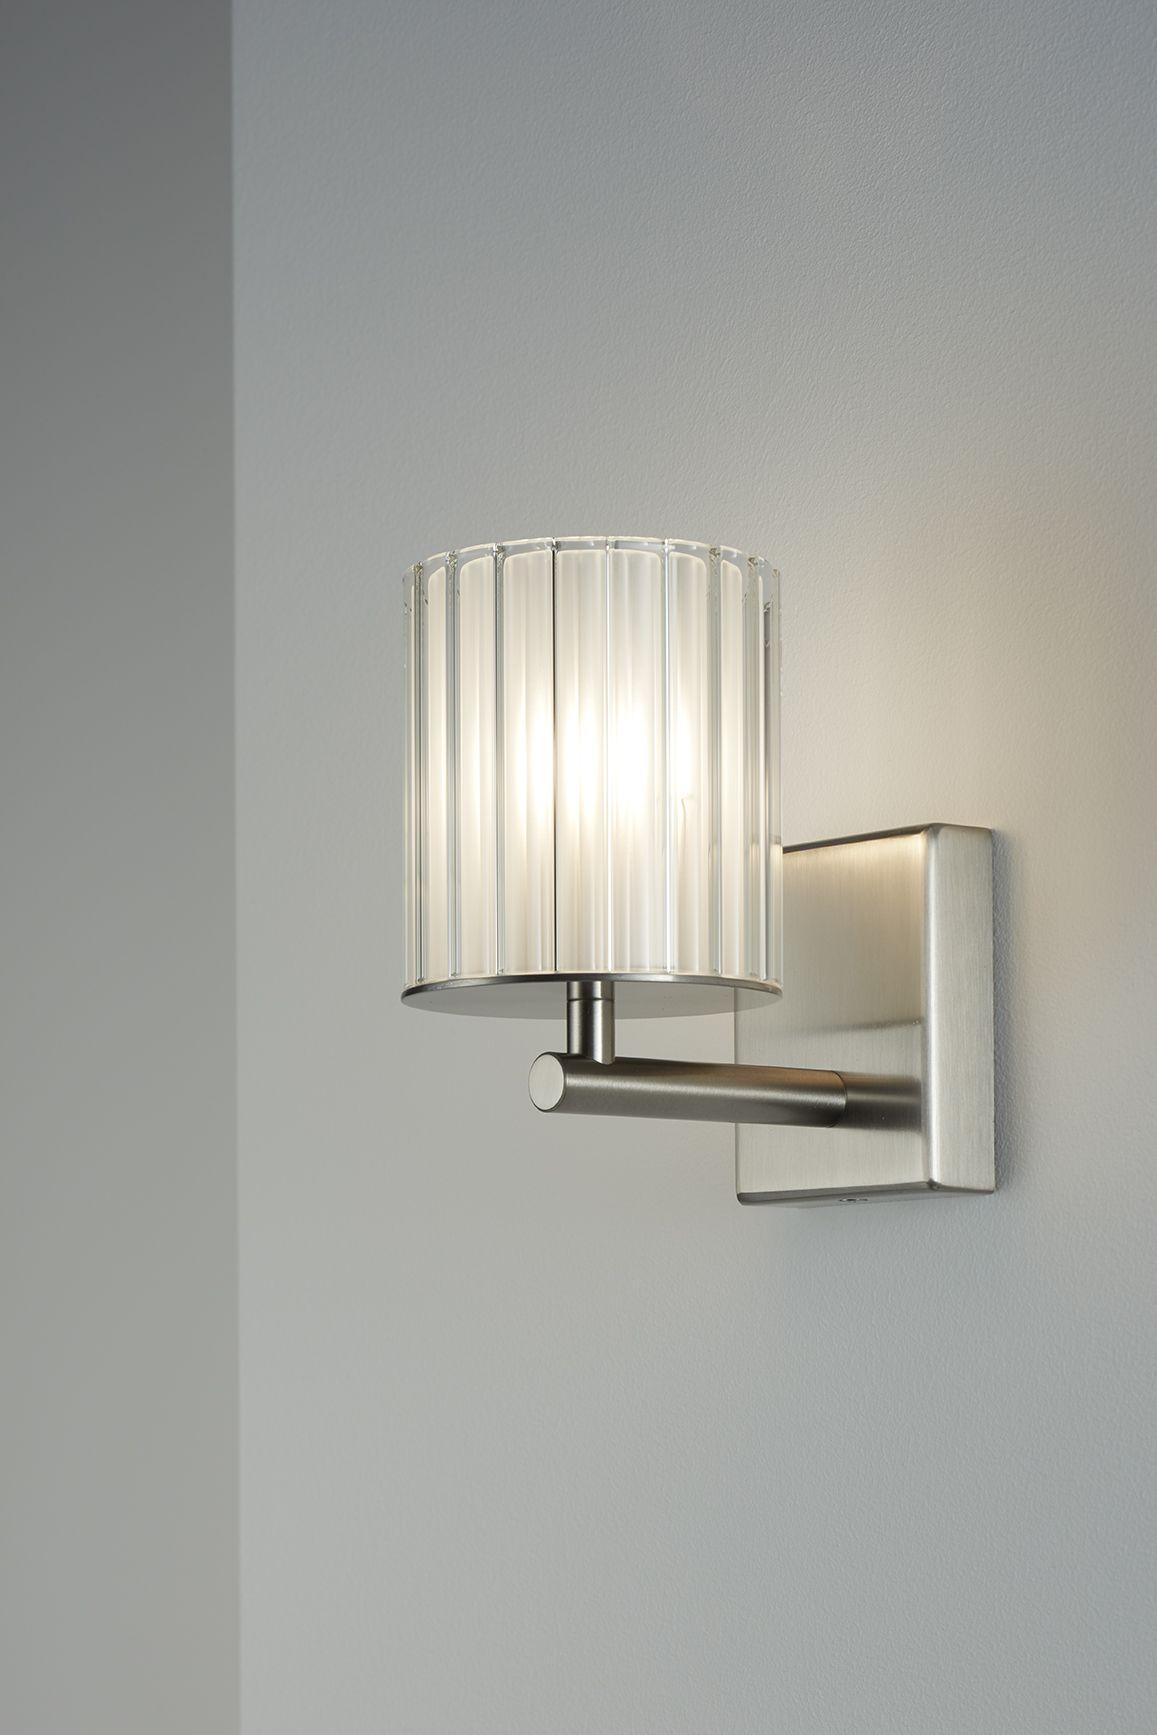 Flwbrushed Nickel Lighting Design Interior Wall Lights Contemporary Lighting